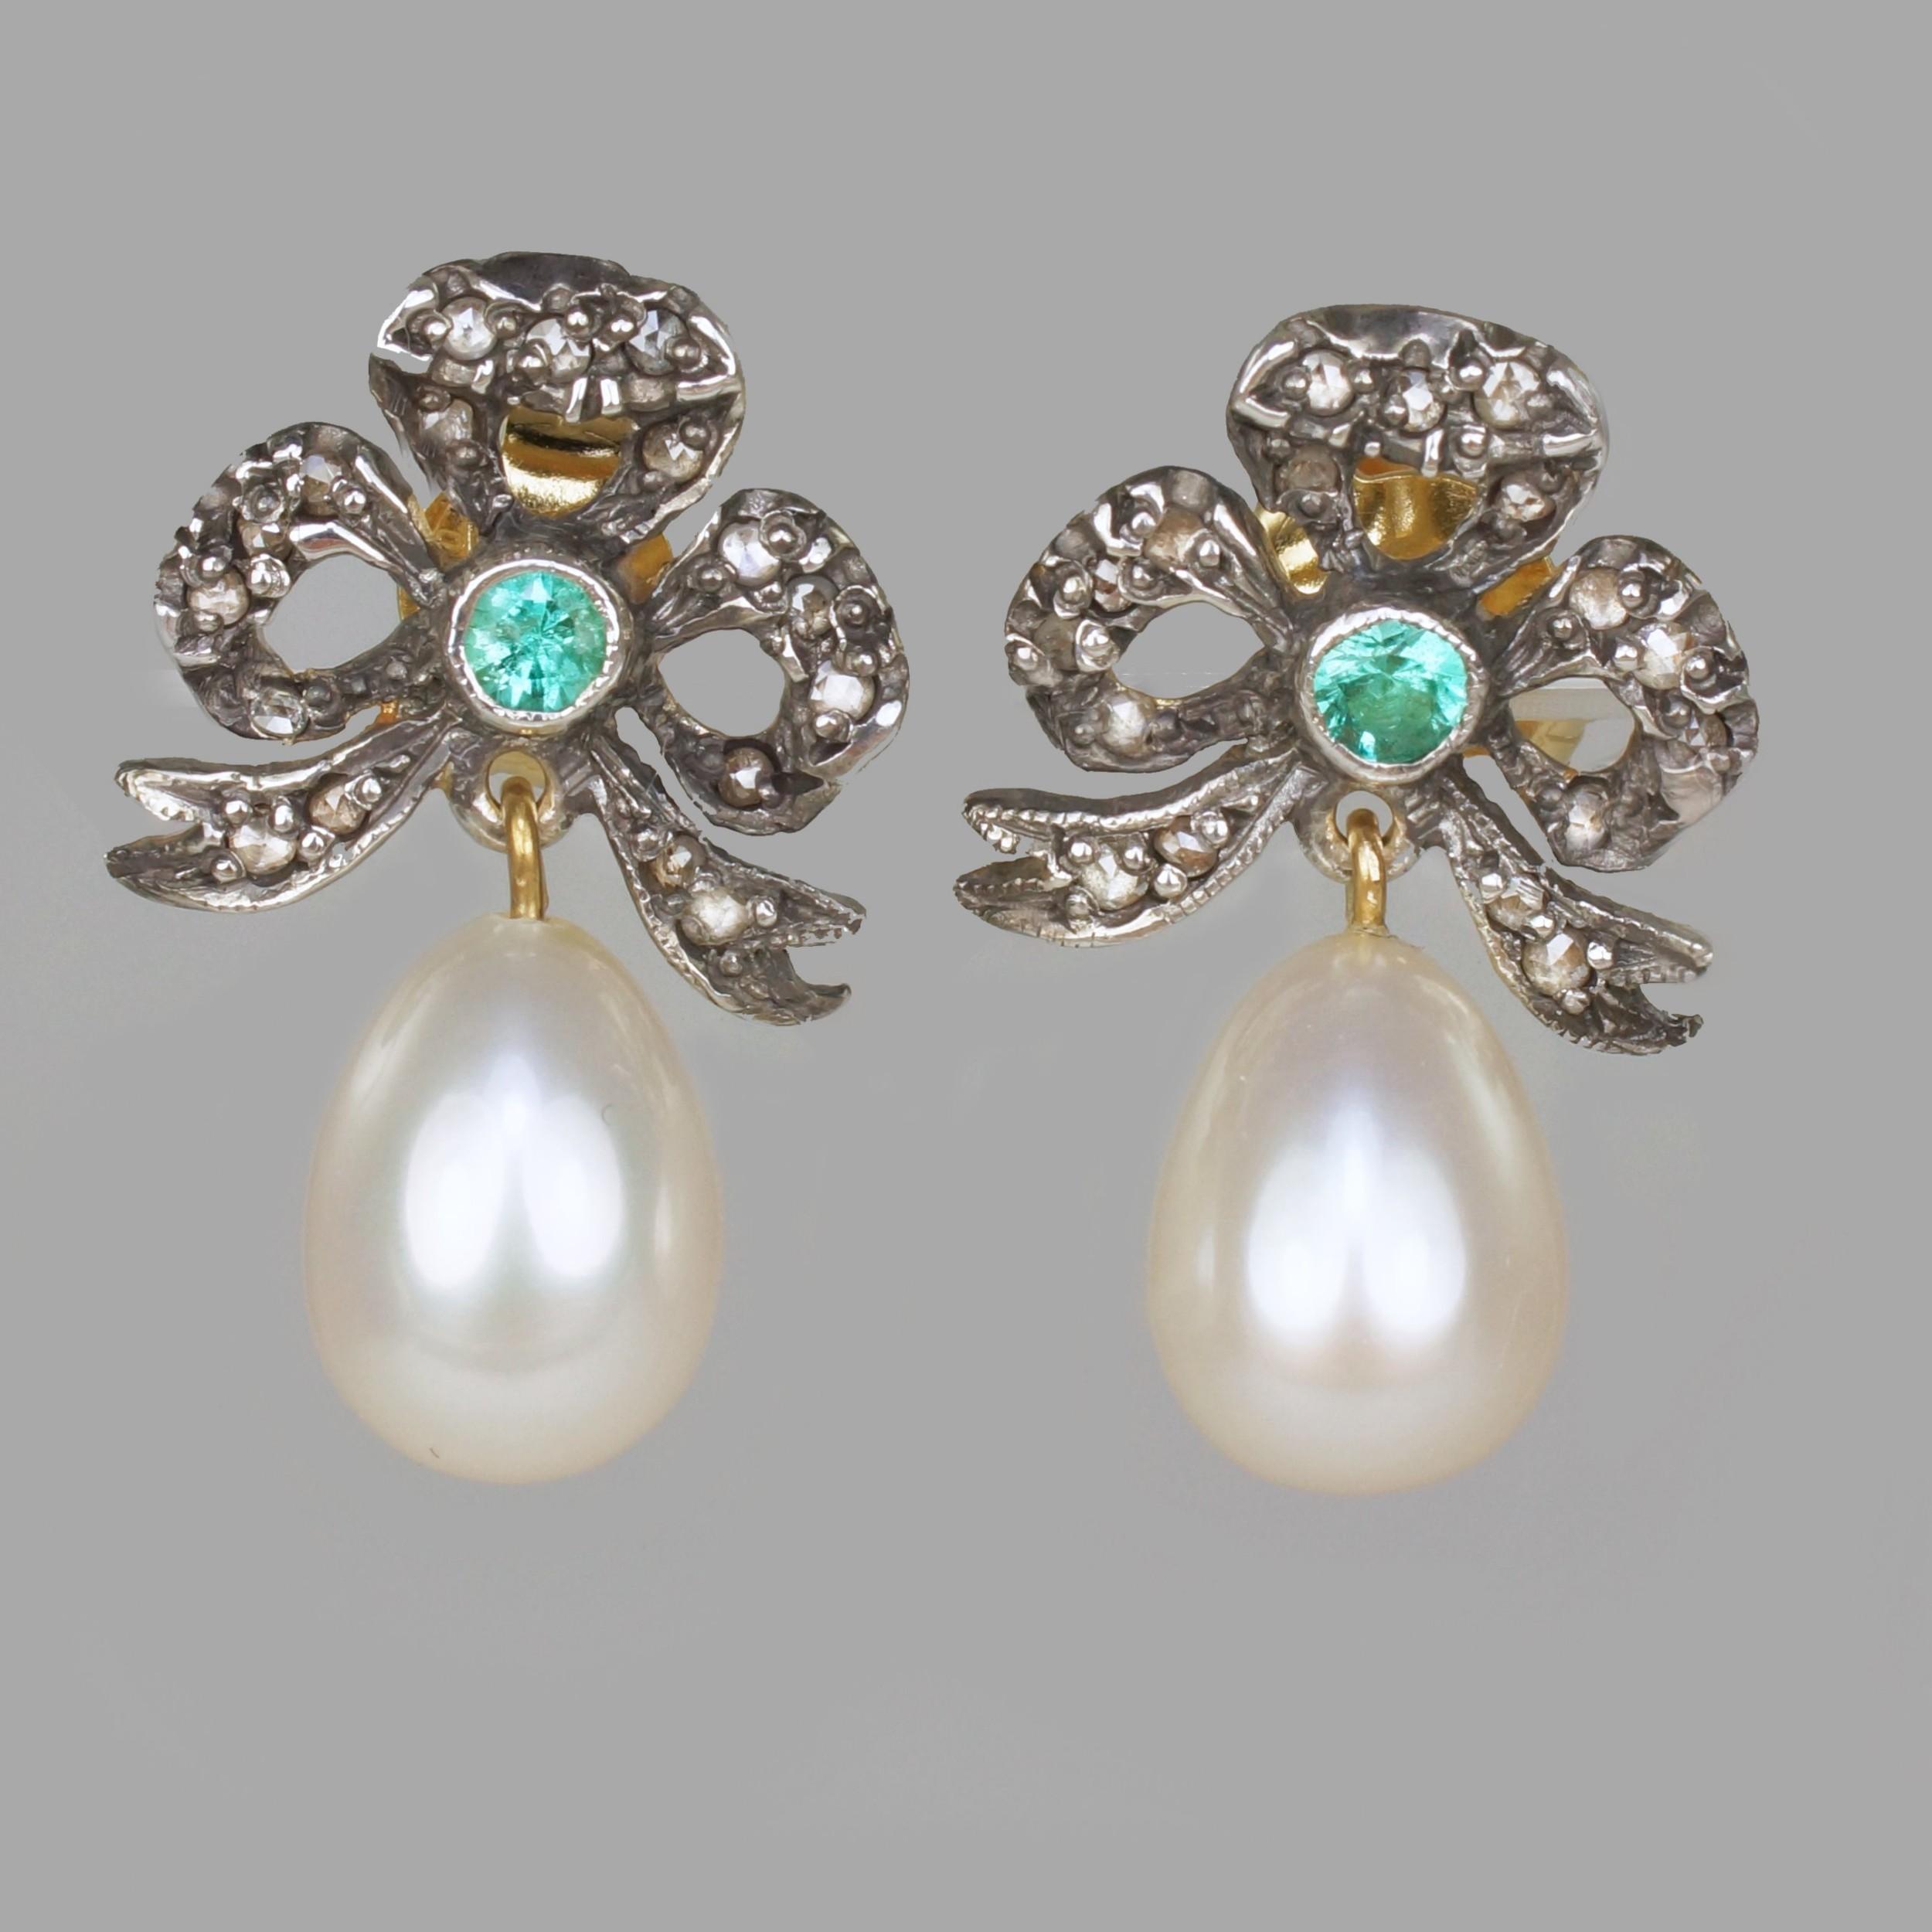 vintage pearl rose cut diamond emerald dangle earrings 18ct gold bow 1 drop victorian style earrings